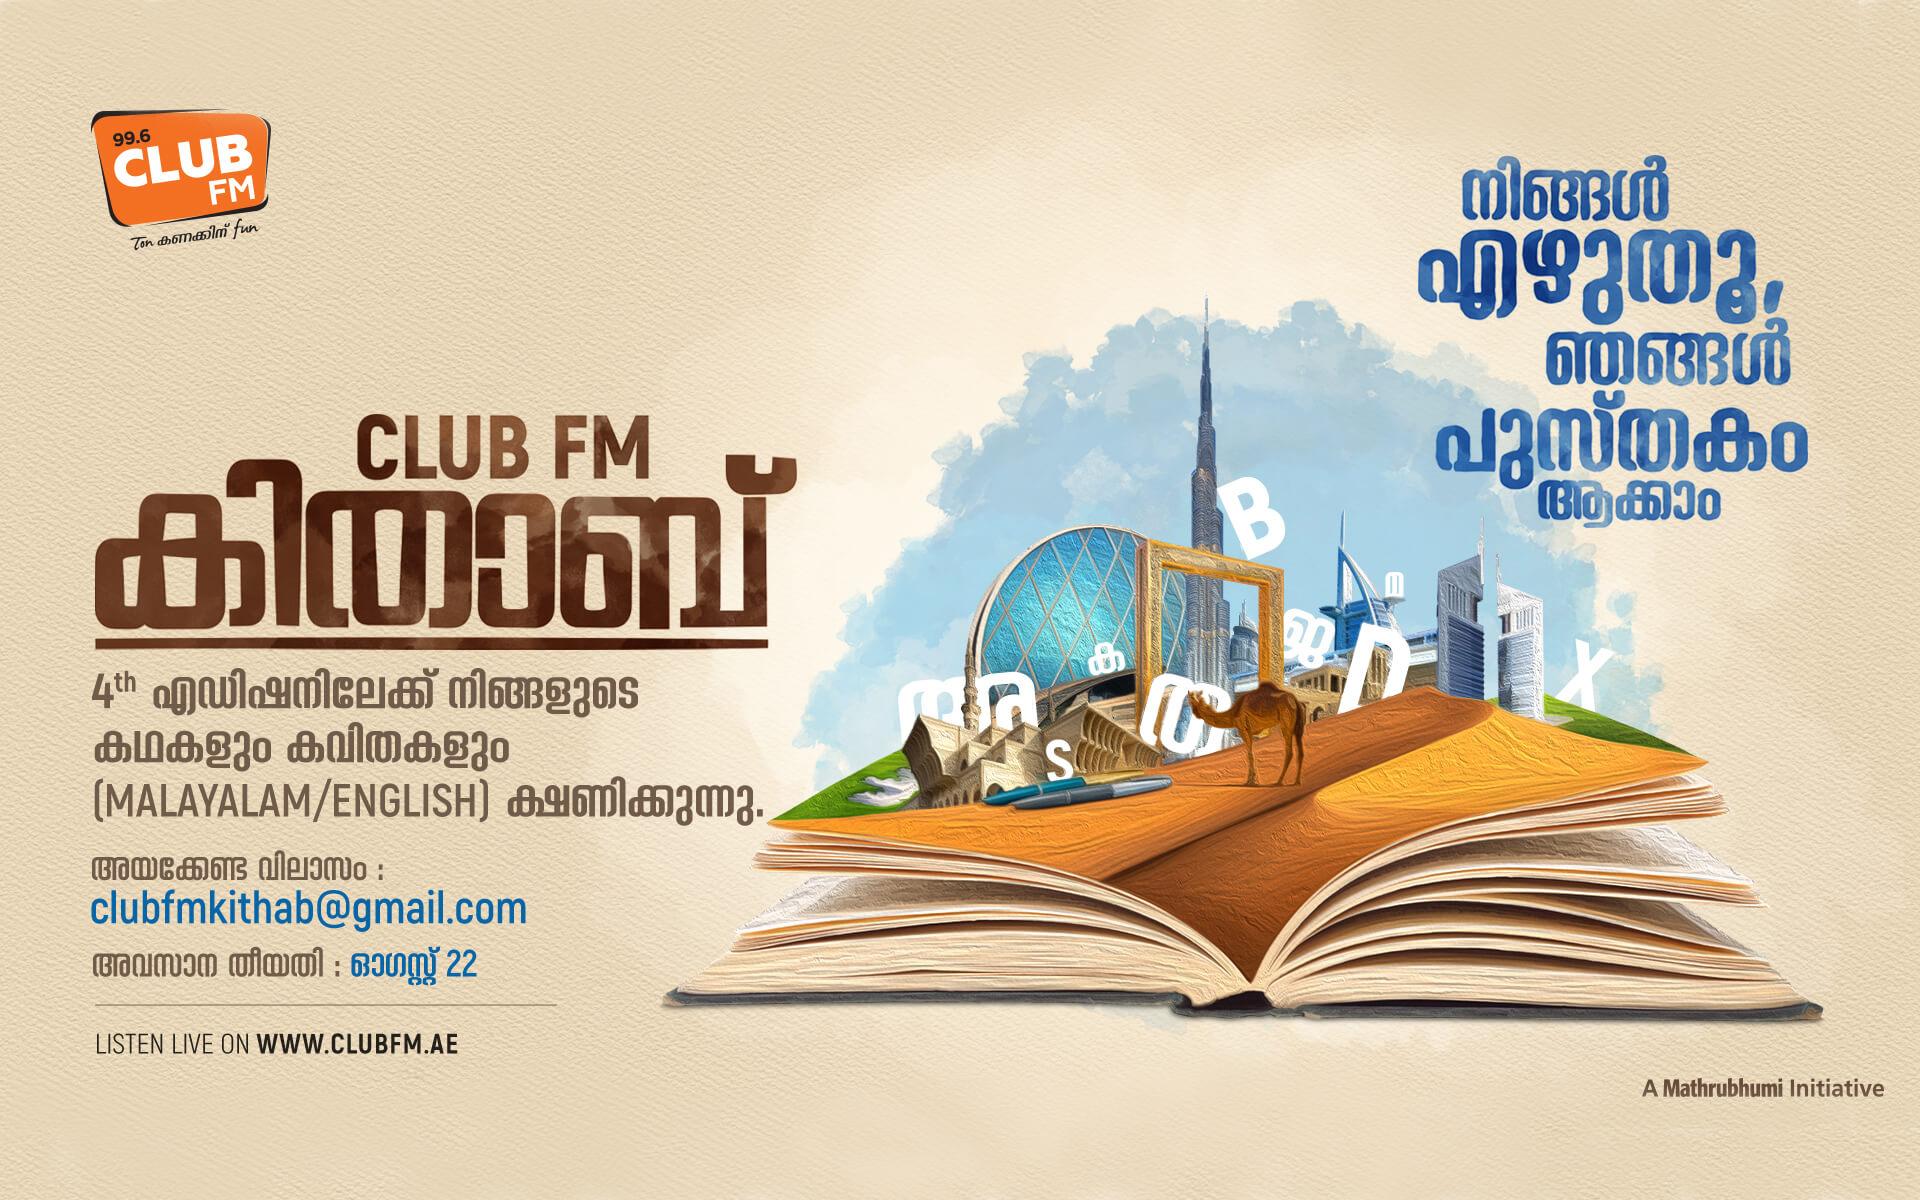 Club FM UAE 99 6 | Ton Kannakinu Fun